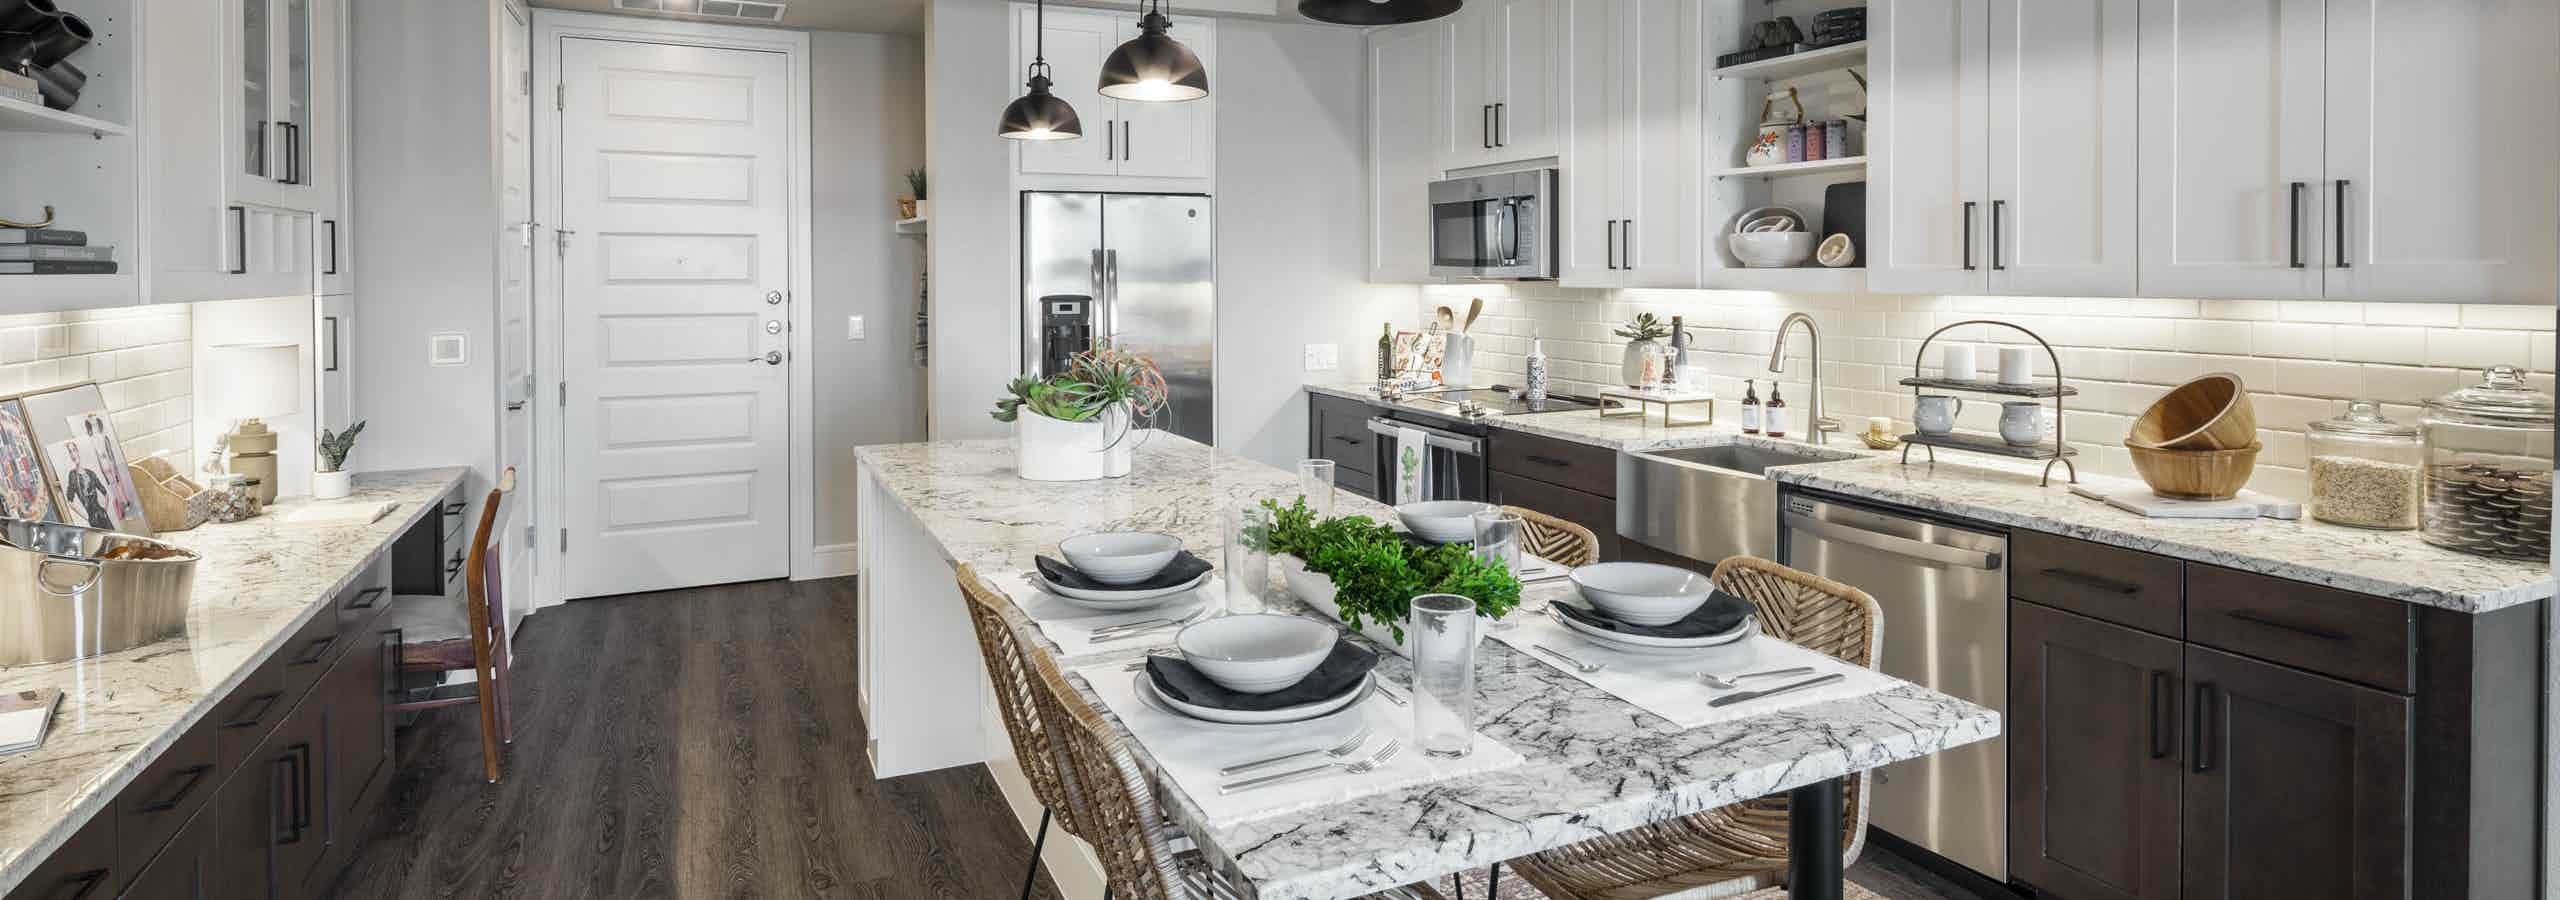 Island kitchen with granite countertops